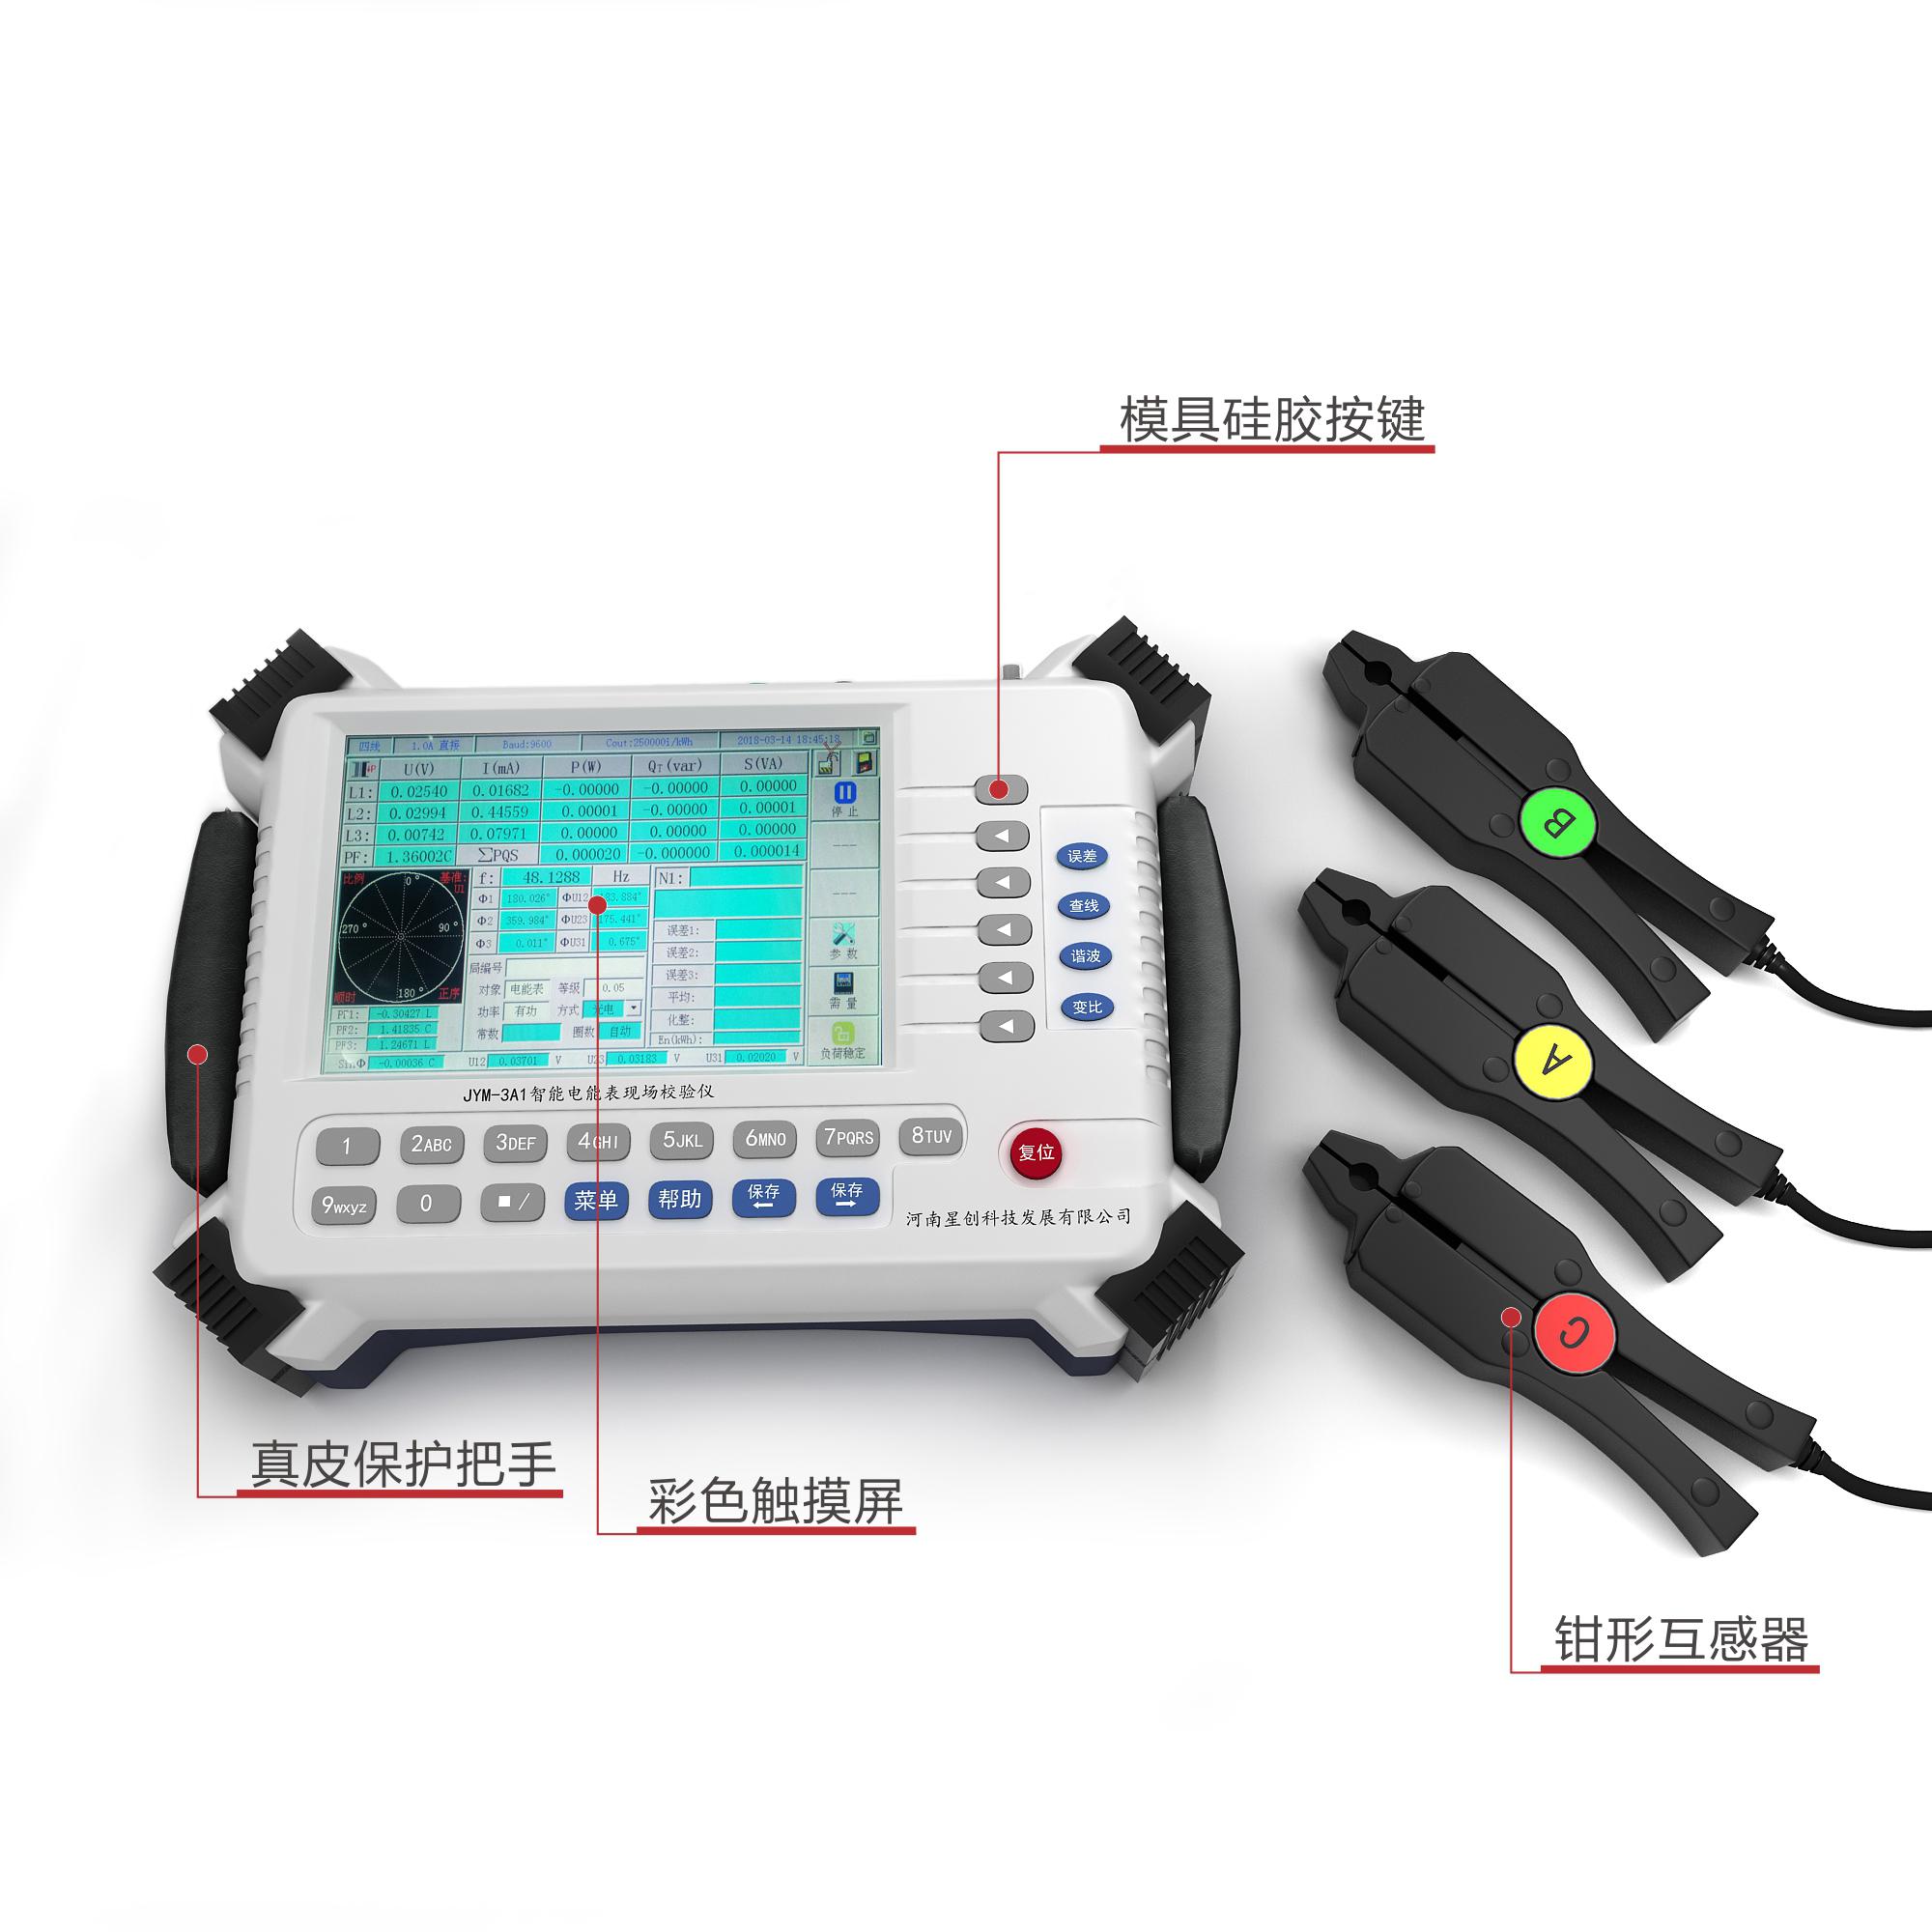 JYM-3A1智能竞技宝下载官网现场校验仪-带线夹-标注.jpg